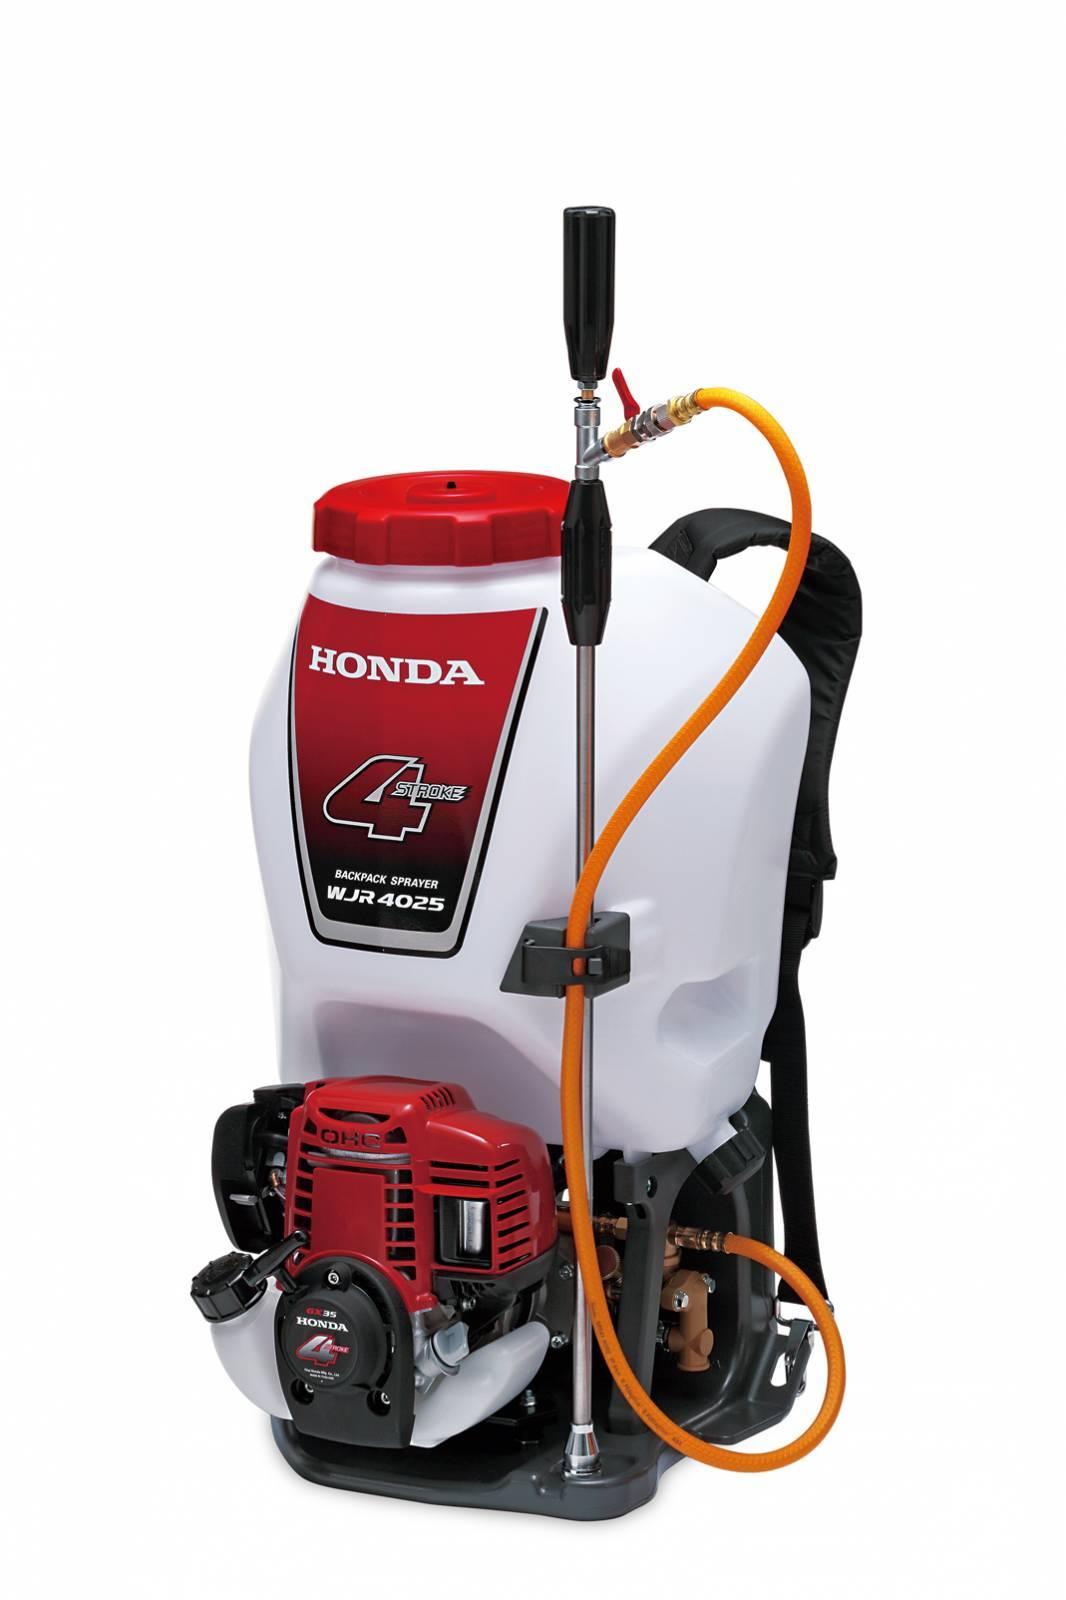 Pulverizador Honda WJR4025T Costal gasolina, ADQUIRA AGORA! - BSS Maquinas